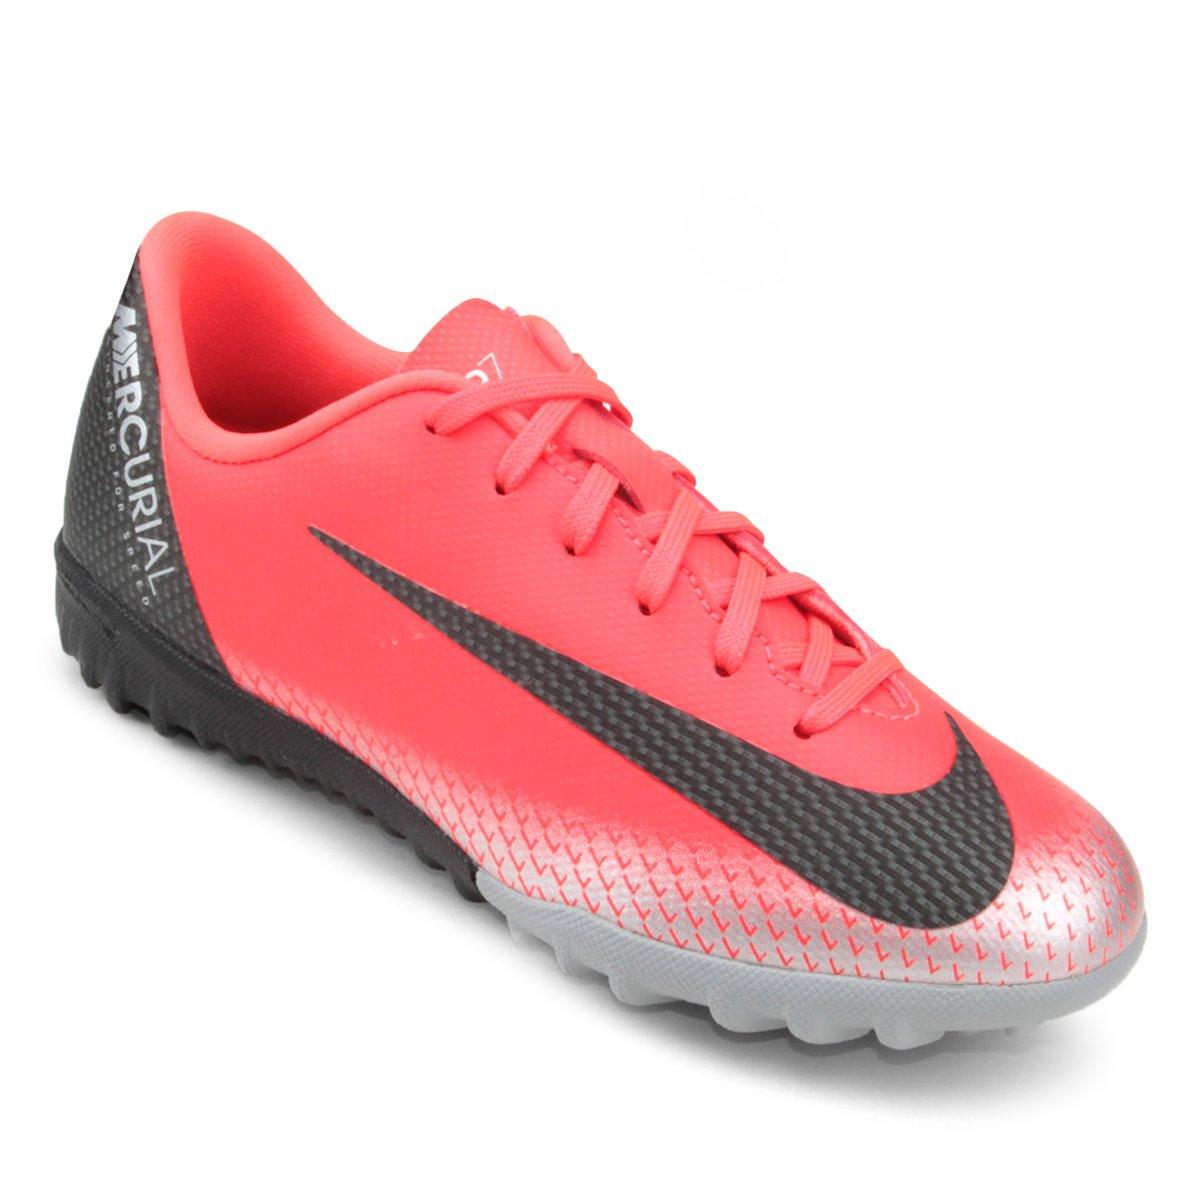 Chuteira Society Infantil Nike Mercurial Vapor 12 Academy GS CR7 TF ... 50e71e4bf890f